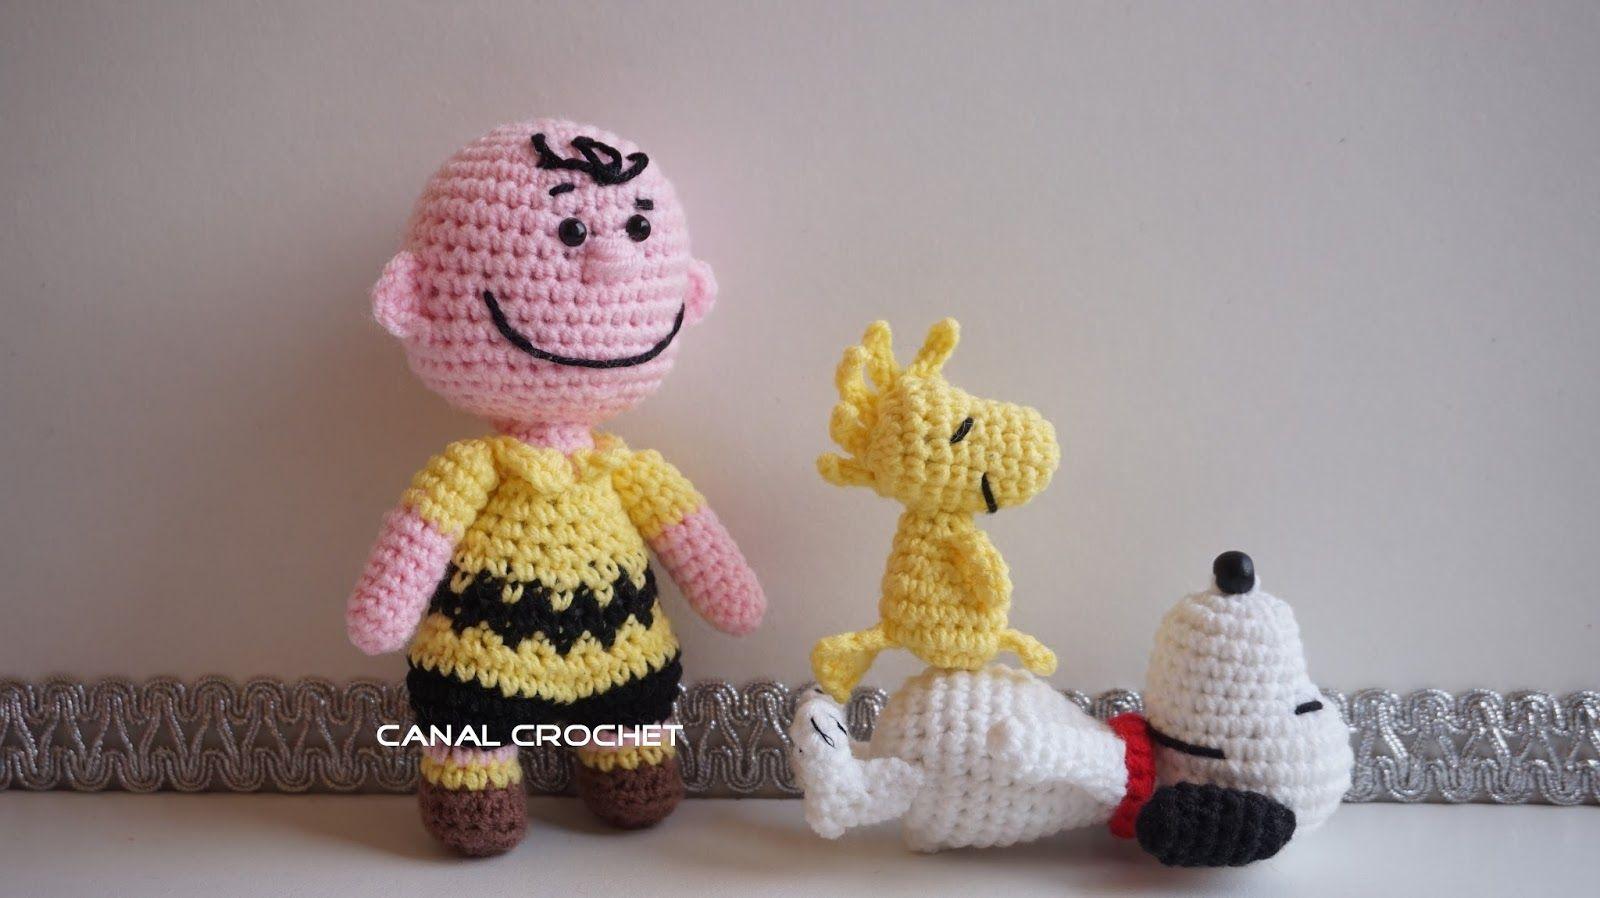 CANAL CROCHET: patrón libre | amigurumis >-< | Pinterest | Crochet ...